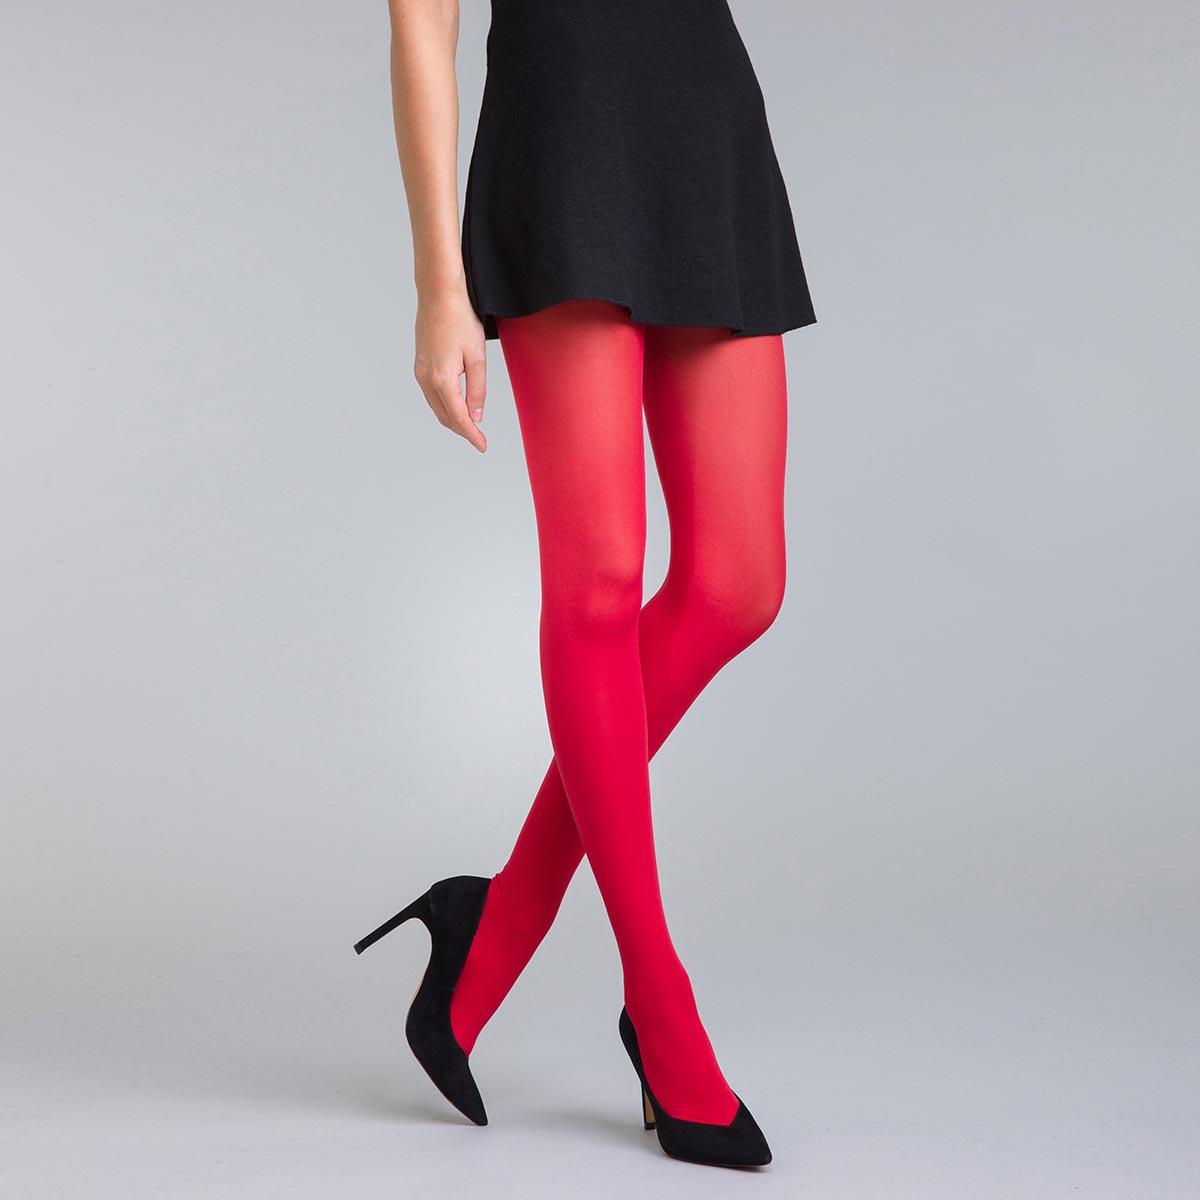 Collant opaque velouté rouge intense 50D Style